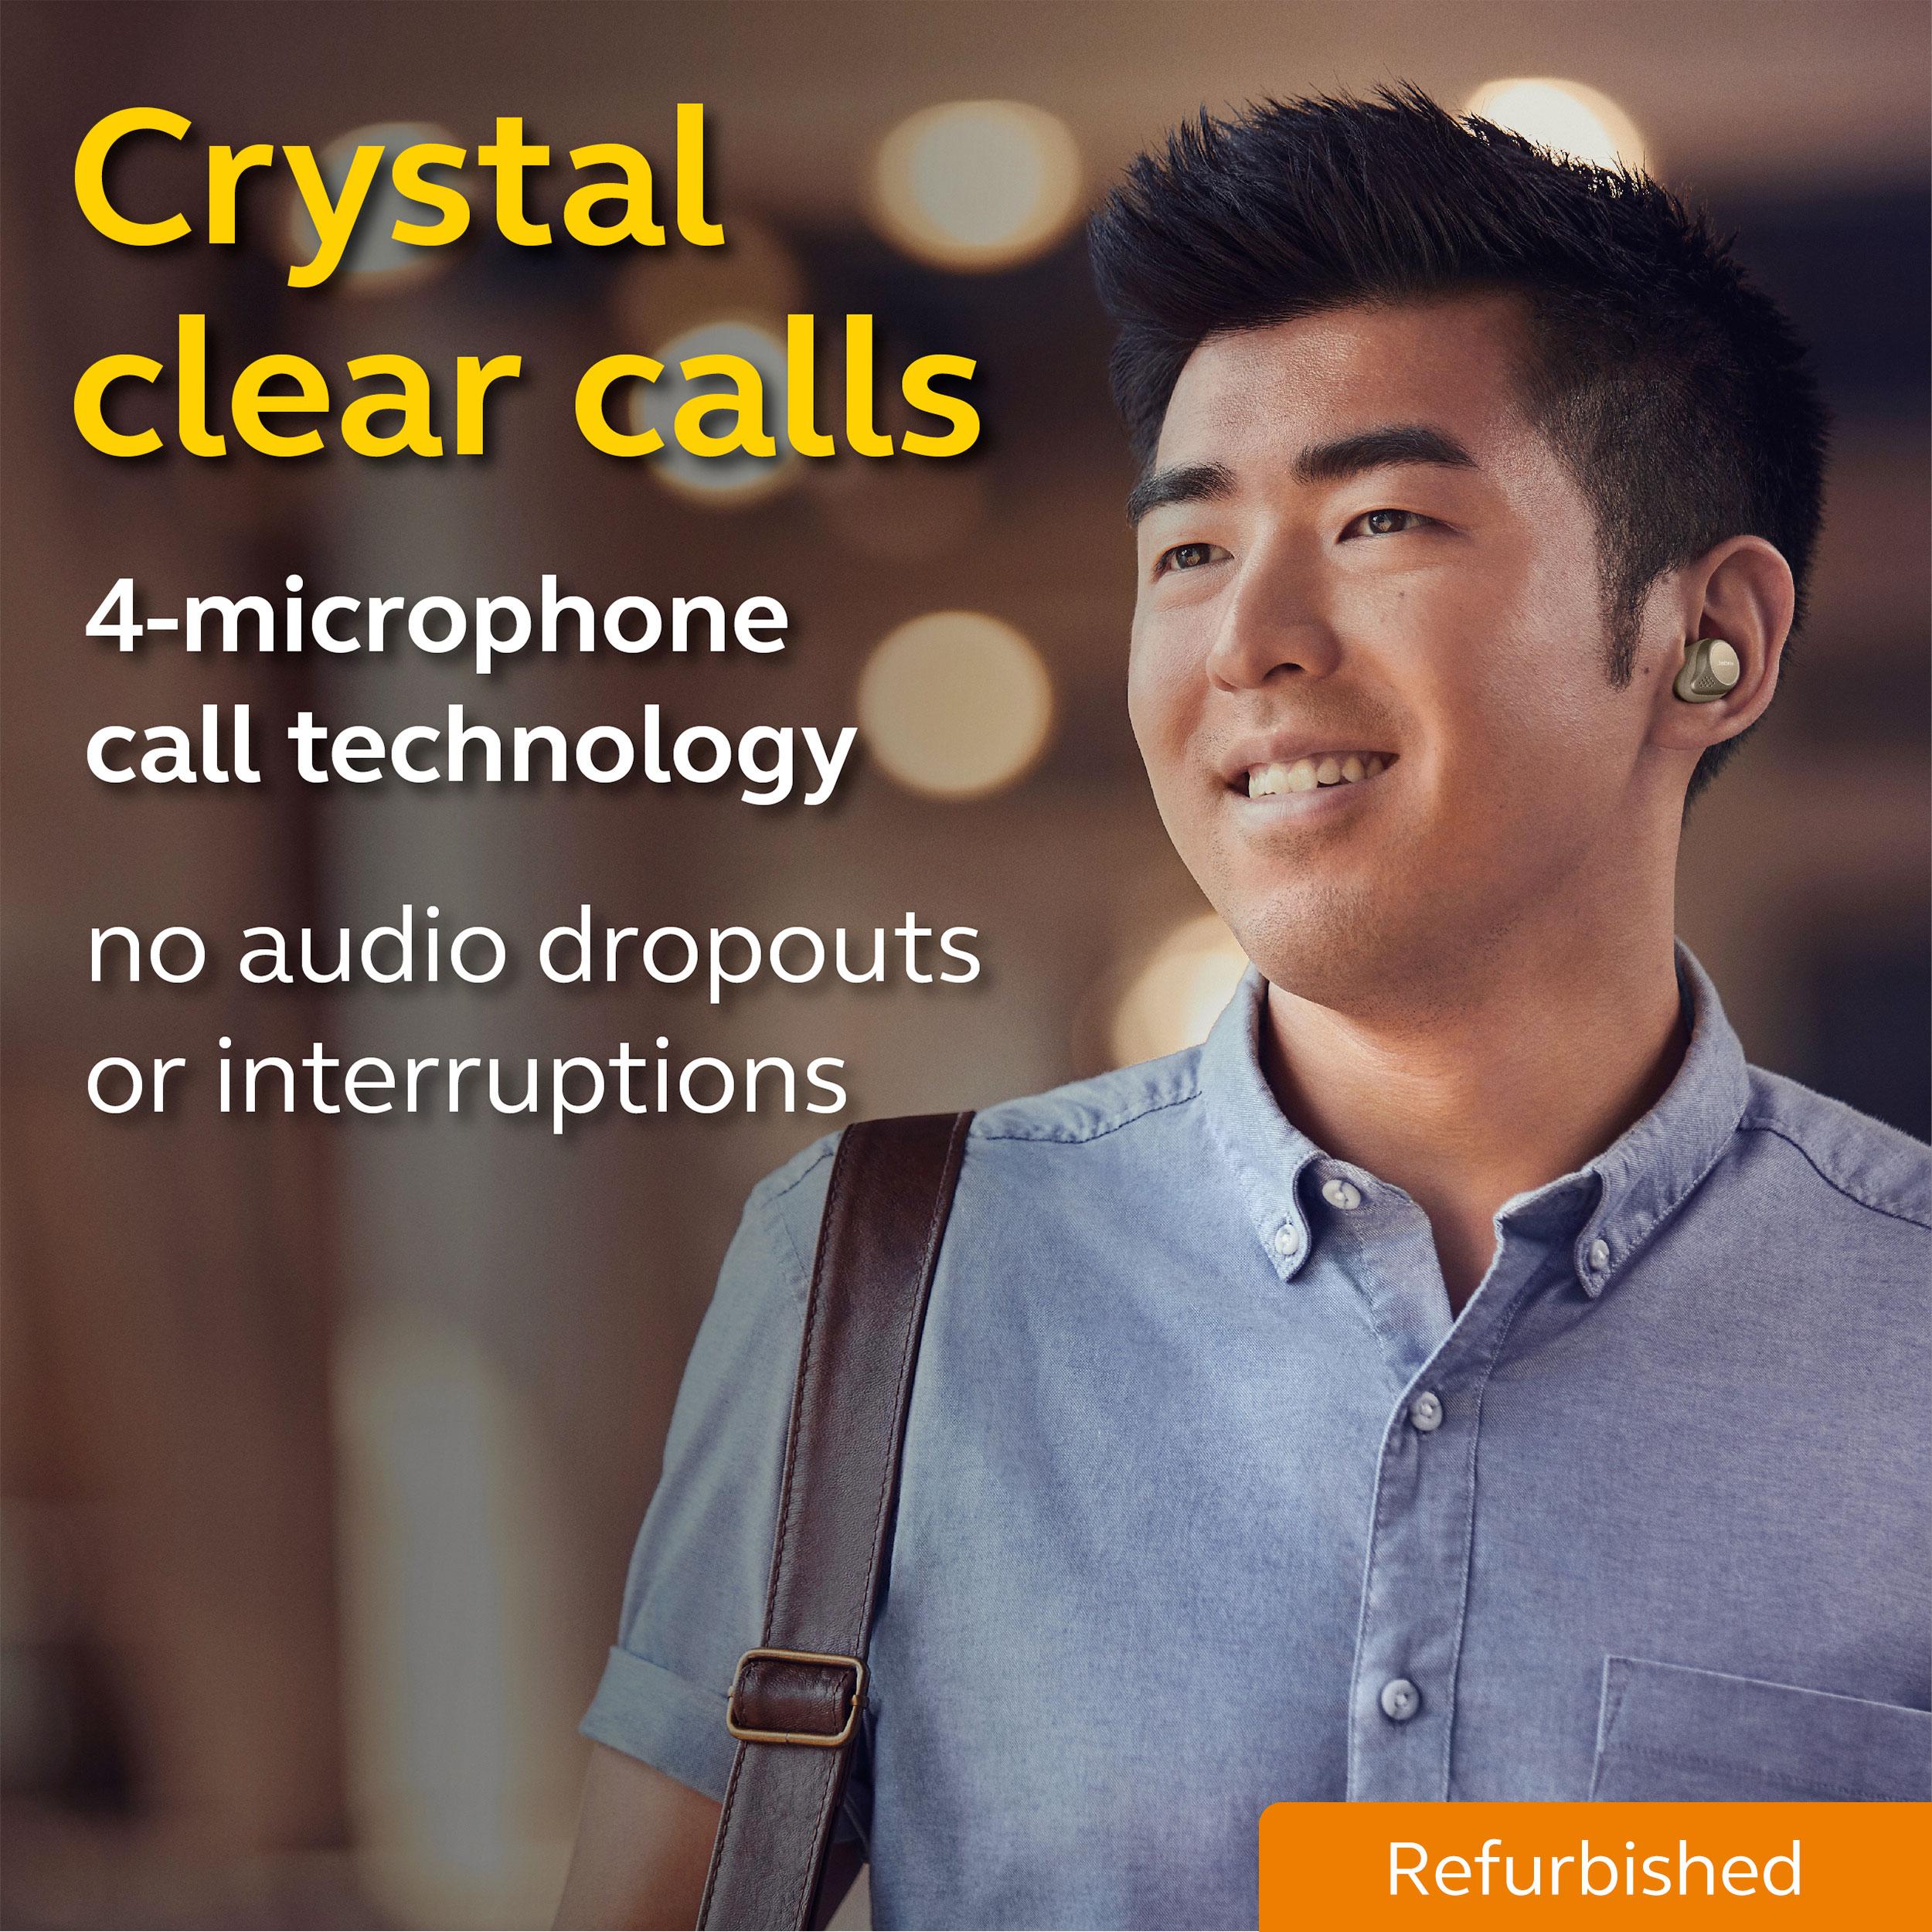 thumbnail 13 - Jabra-Elite-75t-Voice-Assistant-True-Wireless-earbuds-Certified-Refurbished